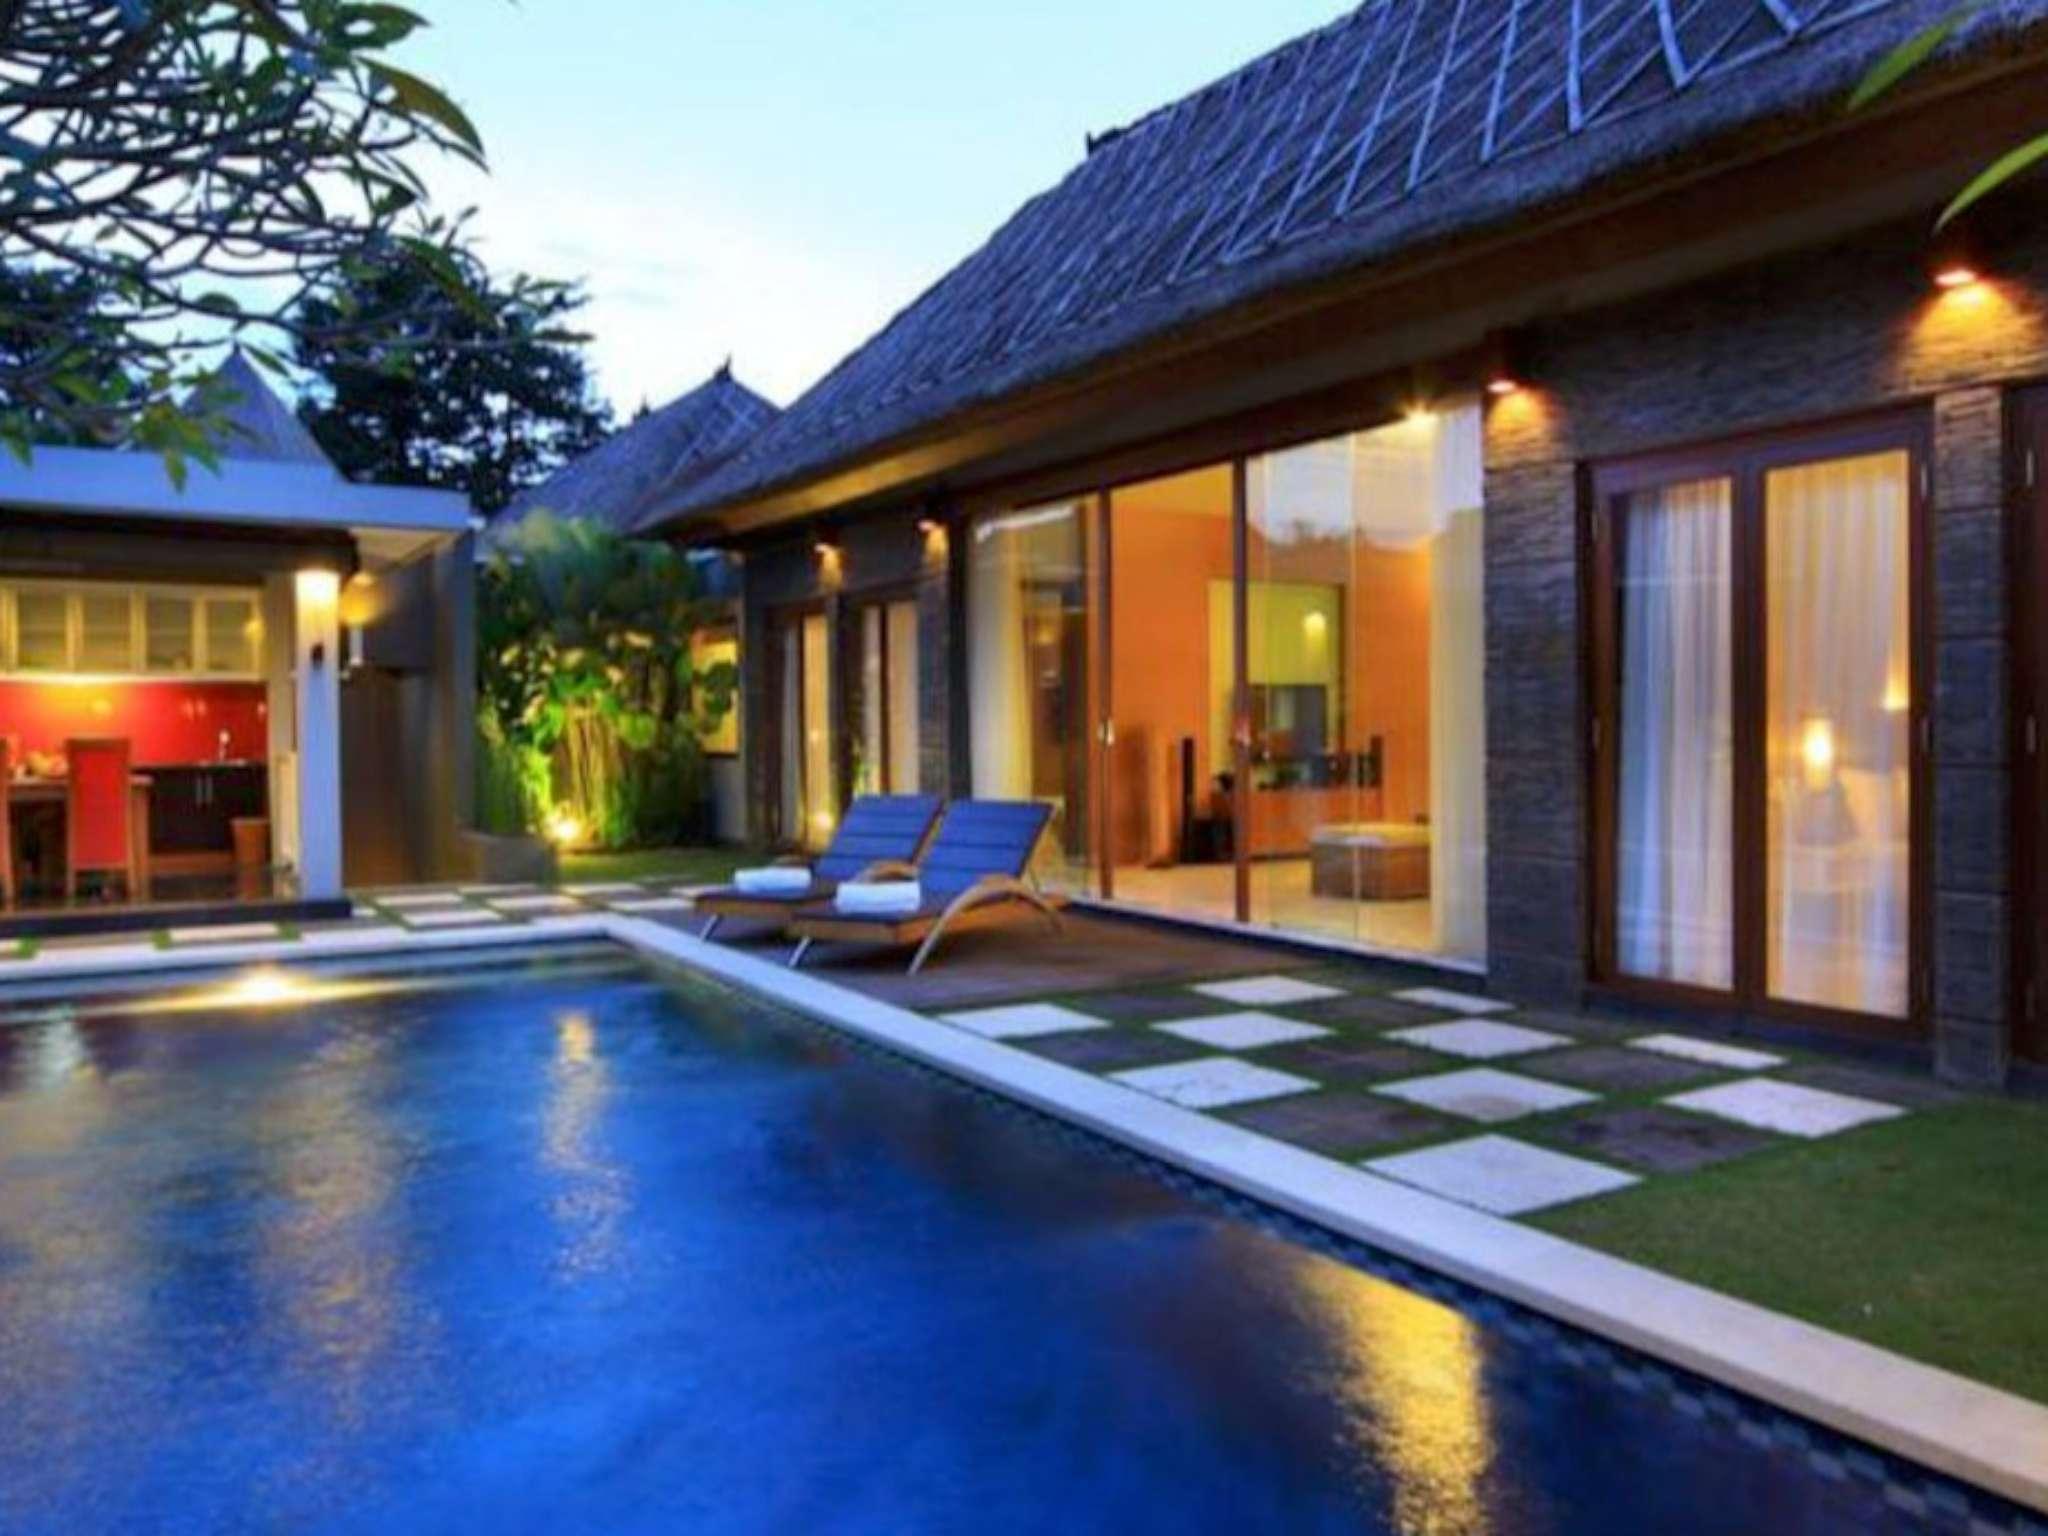 2 BDR Abi Villa Private Pool At Jimbaran